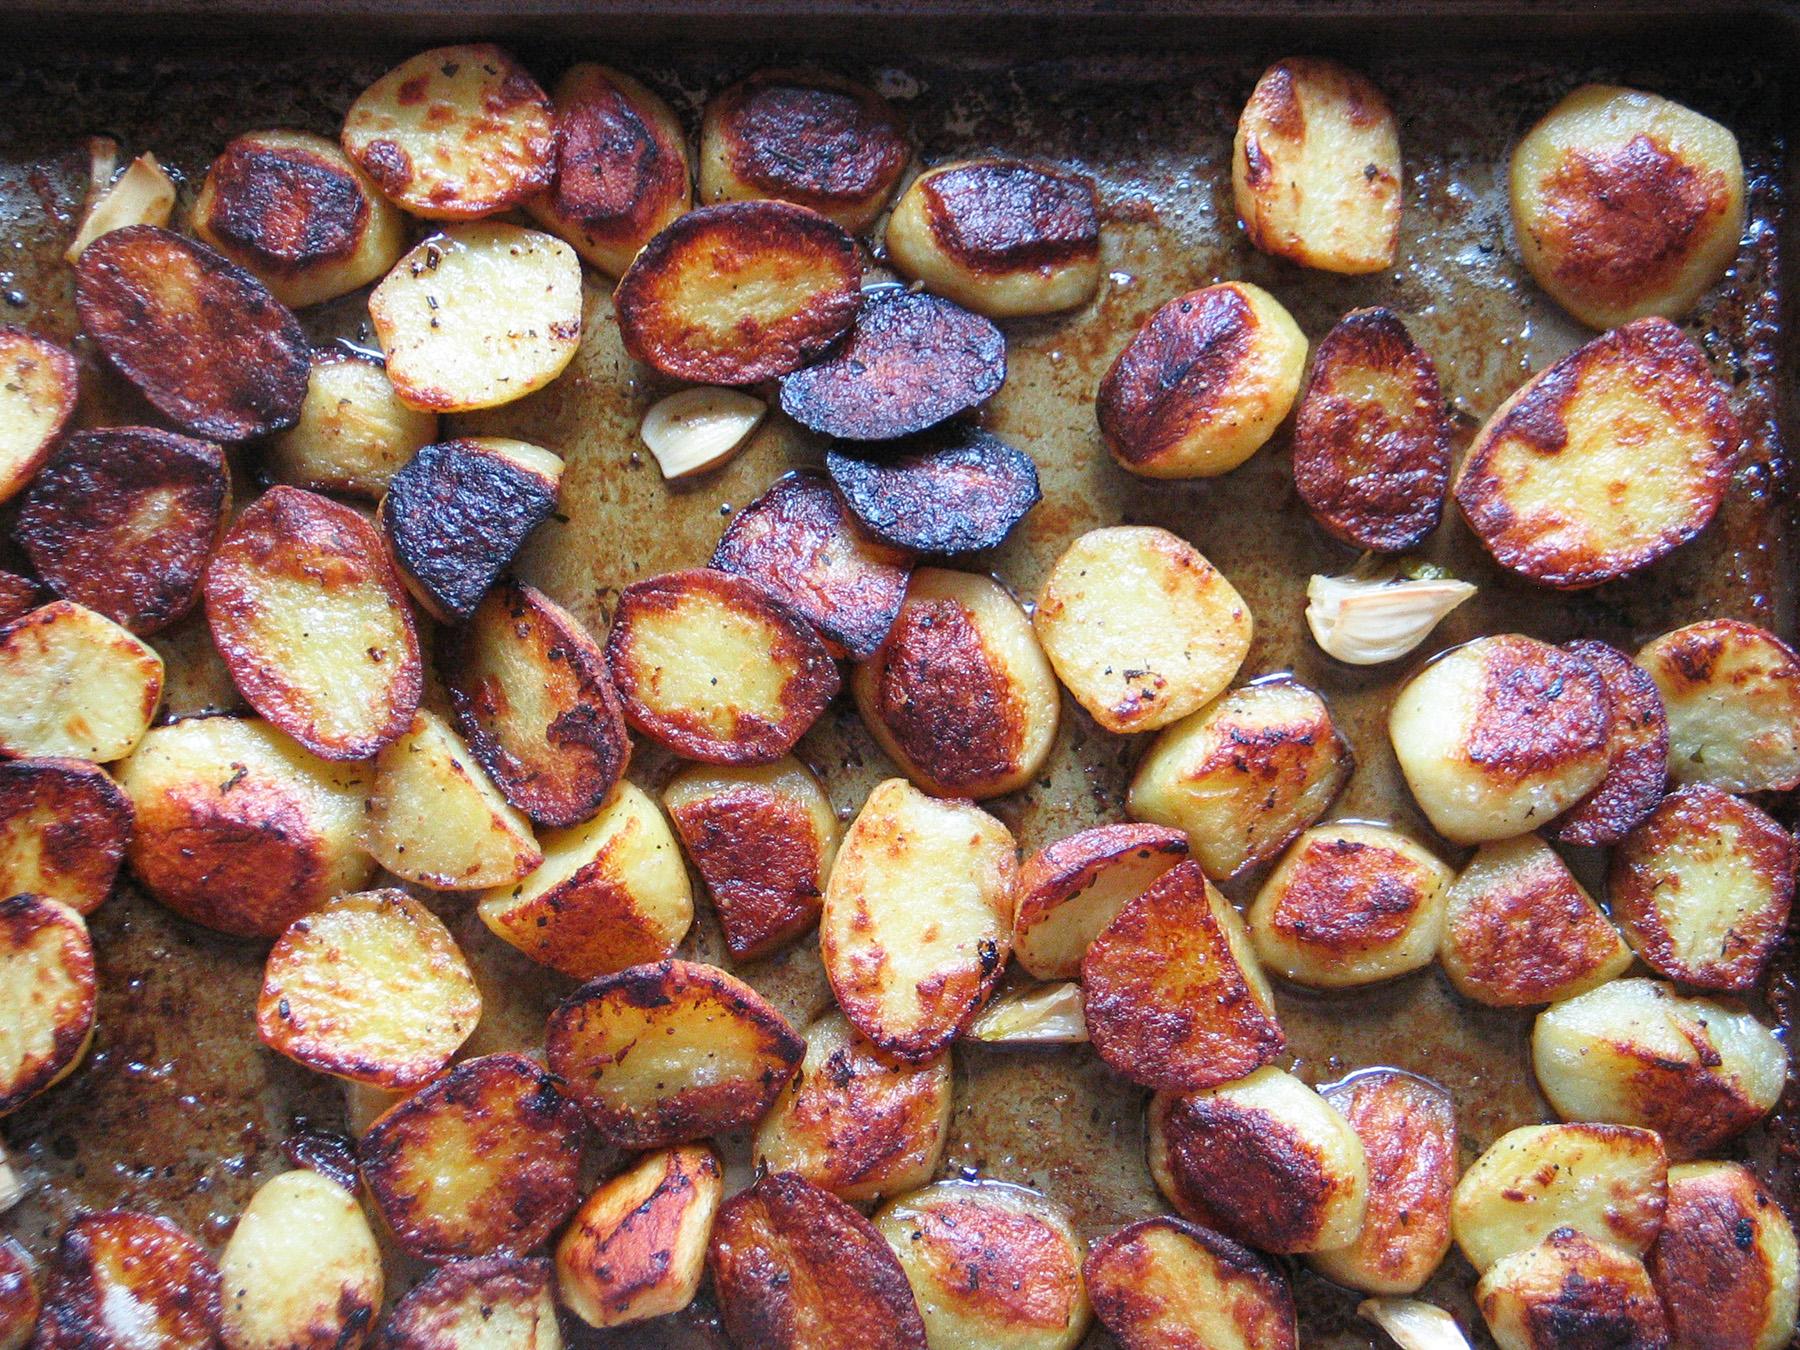 Deanna S Daughter Melting Potatoes